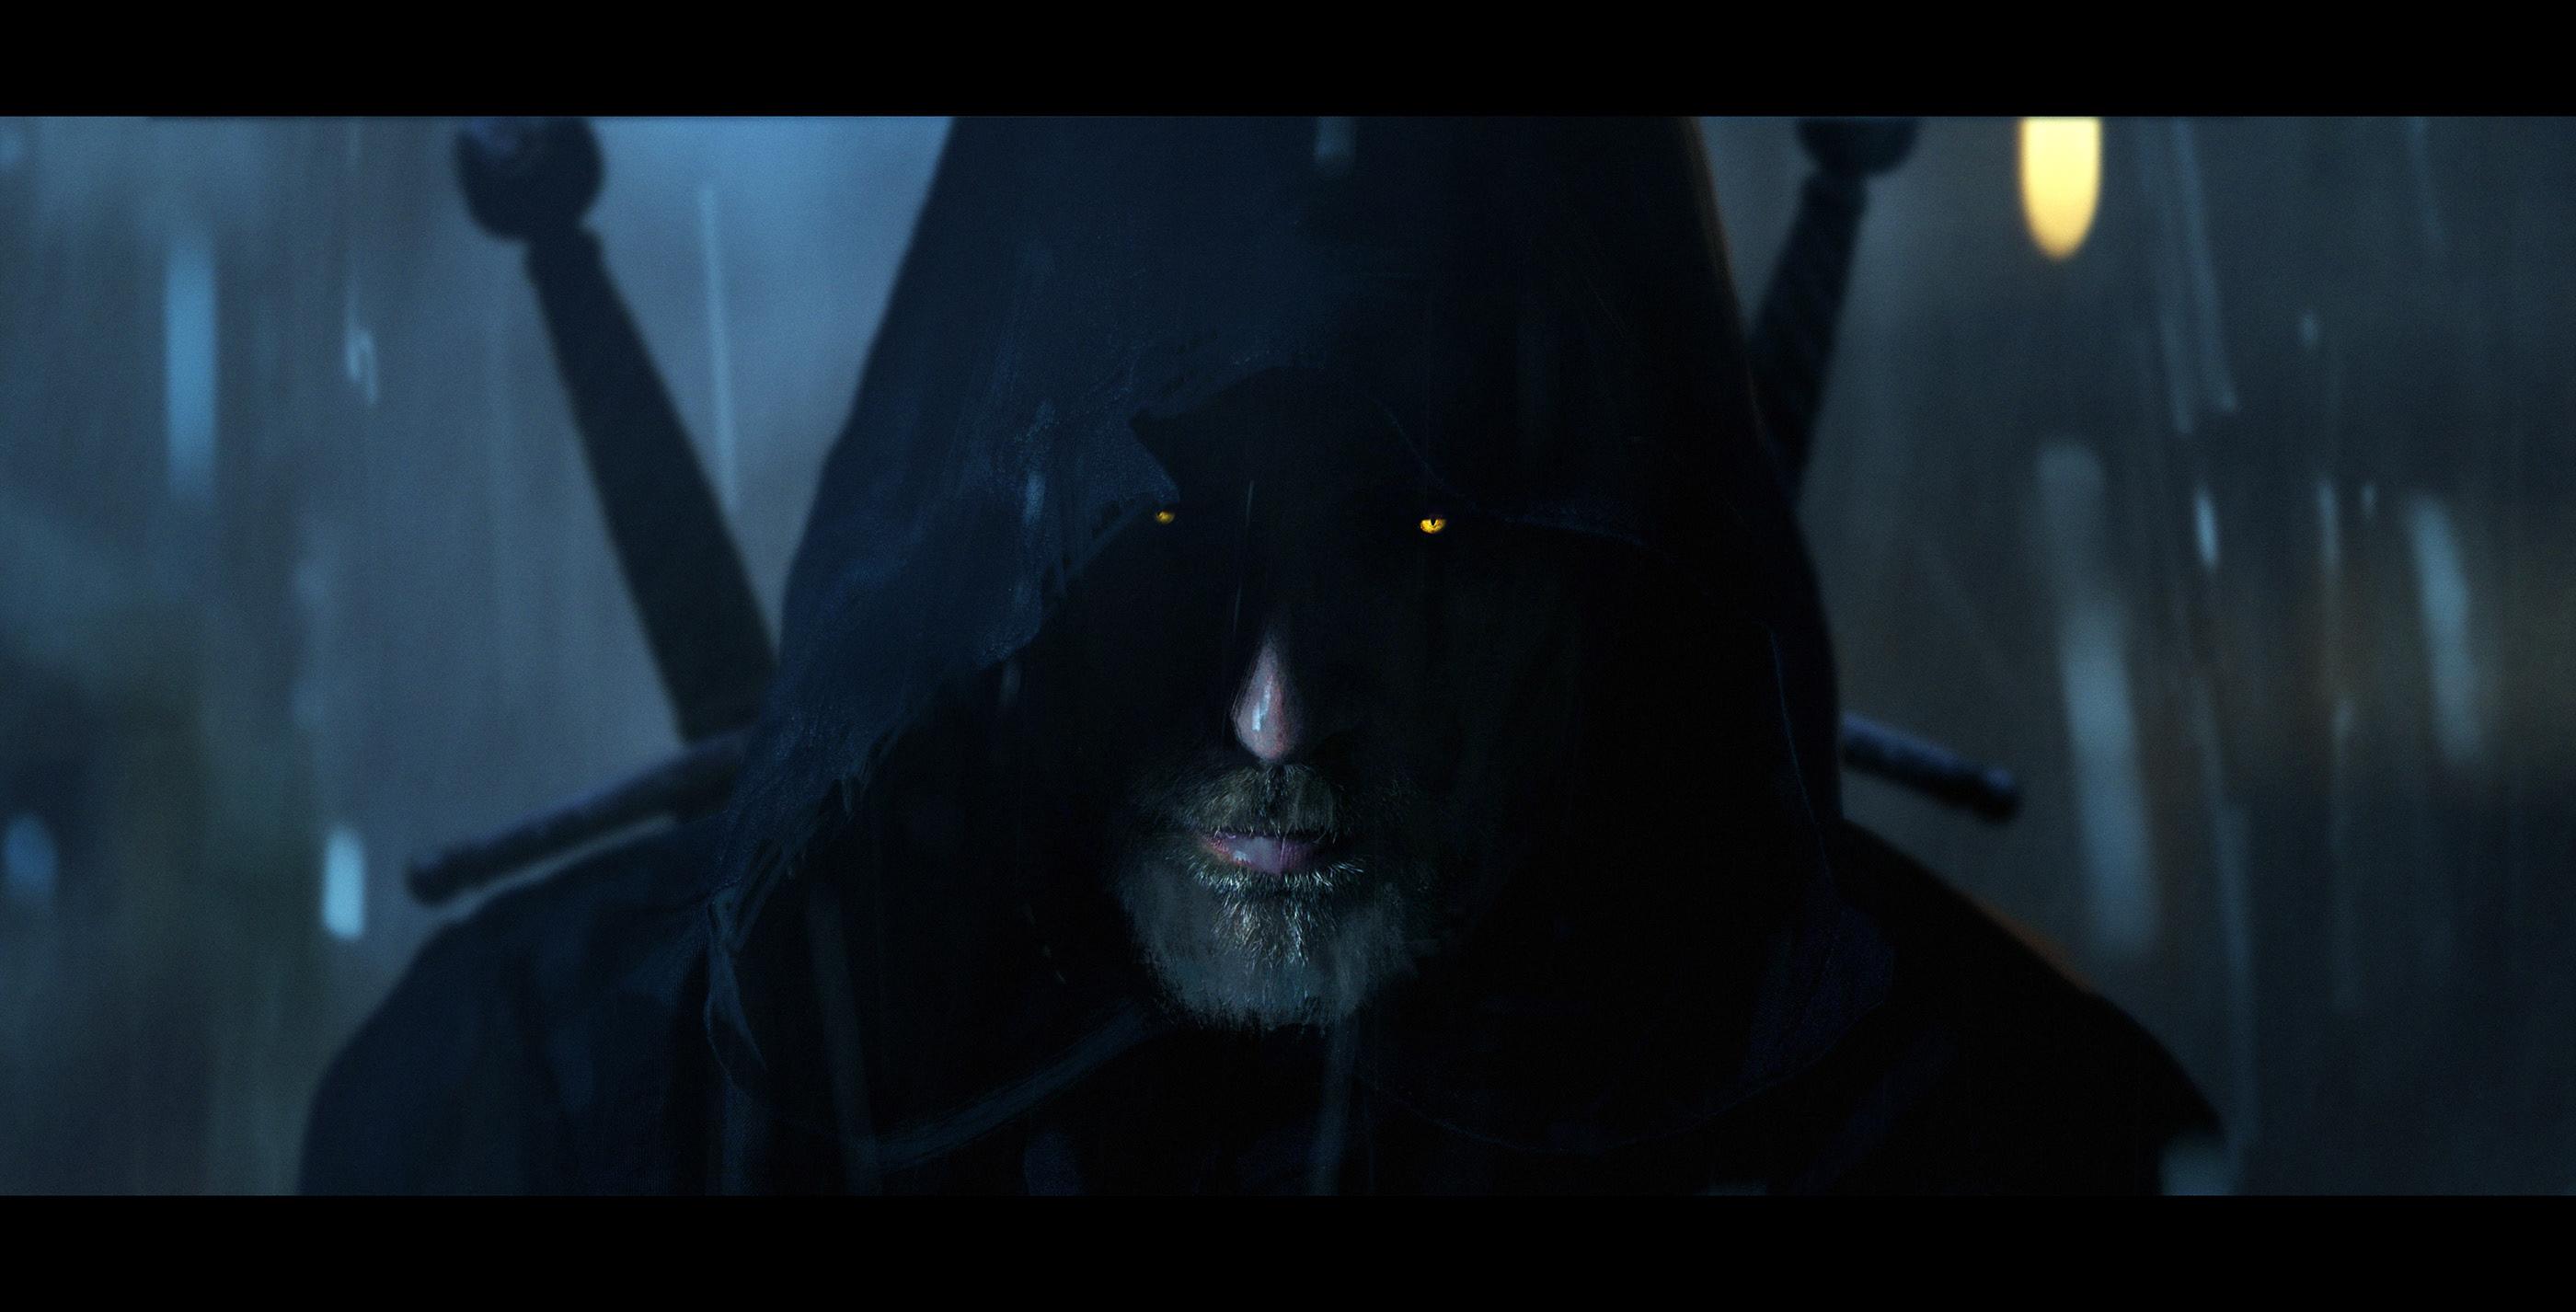 fd299081867863.5d0c05580aa7d.jpg - Witcher 3: Wild Hunt, the арт